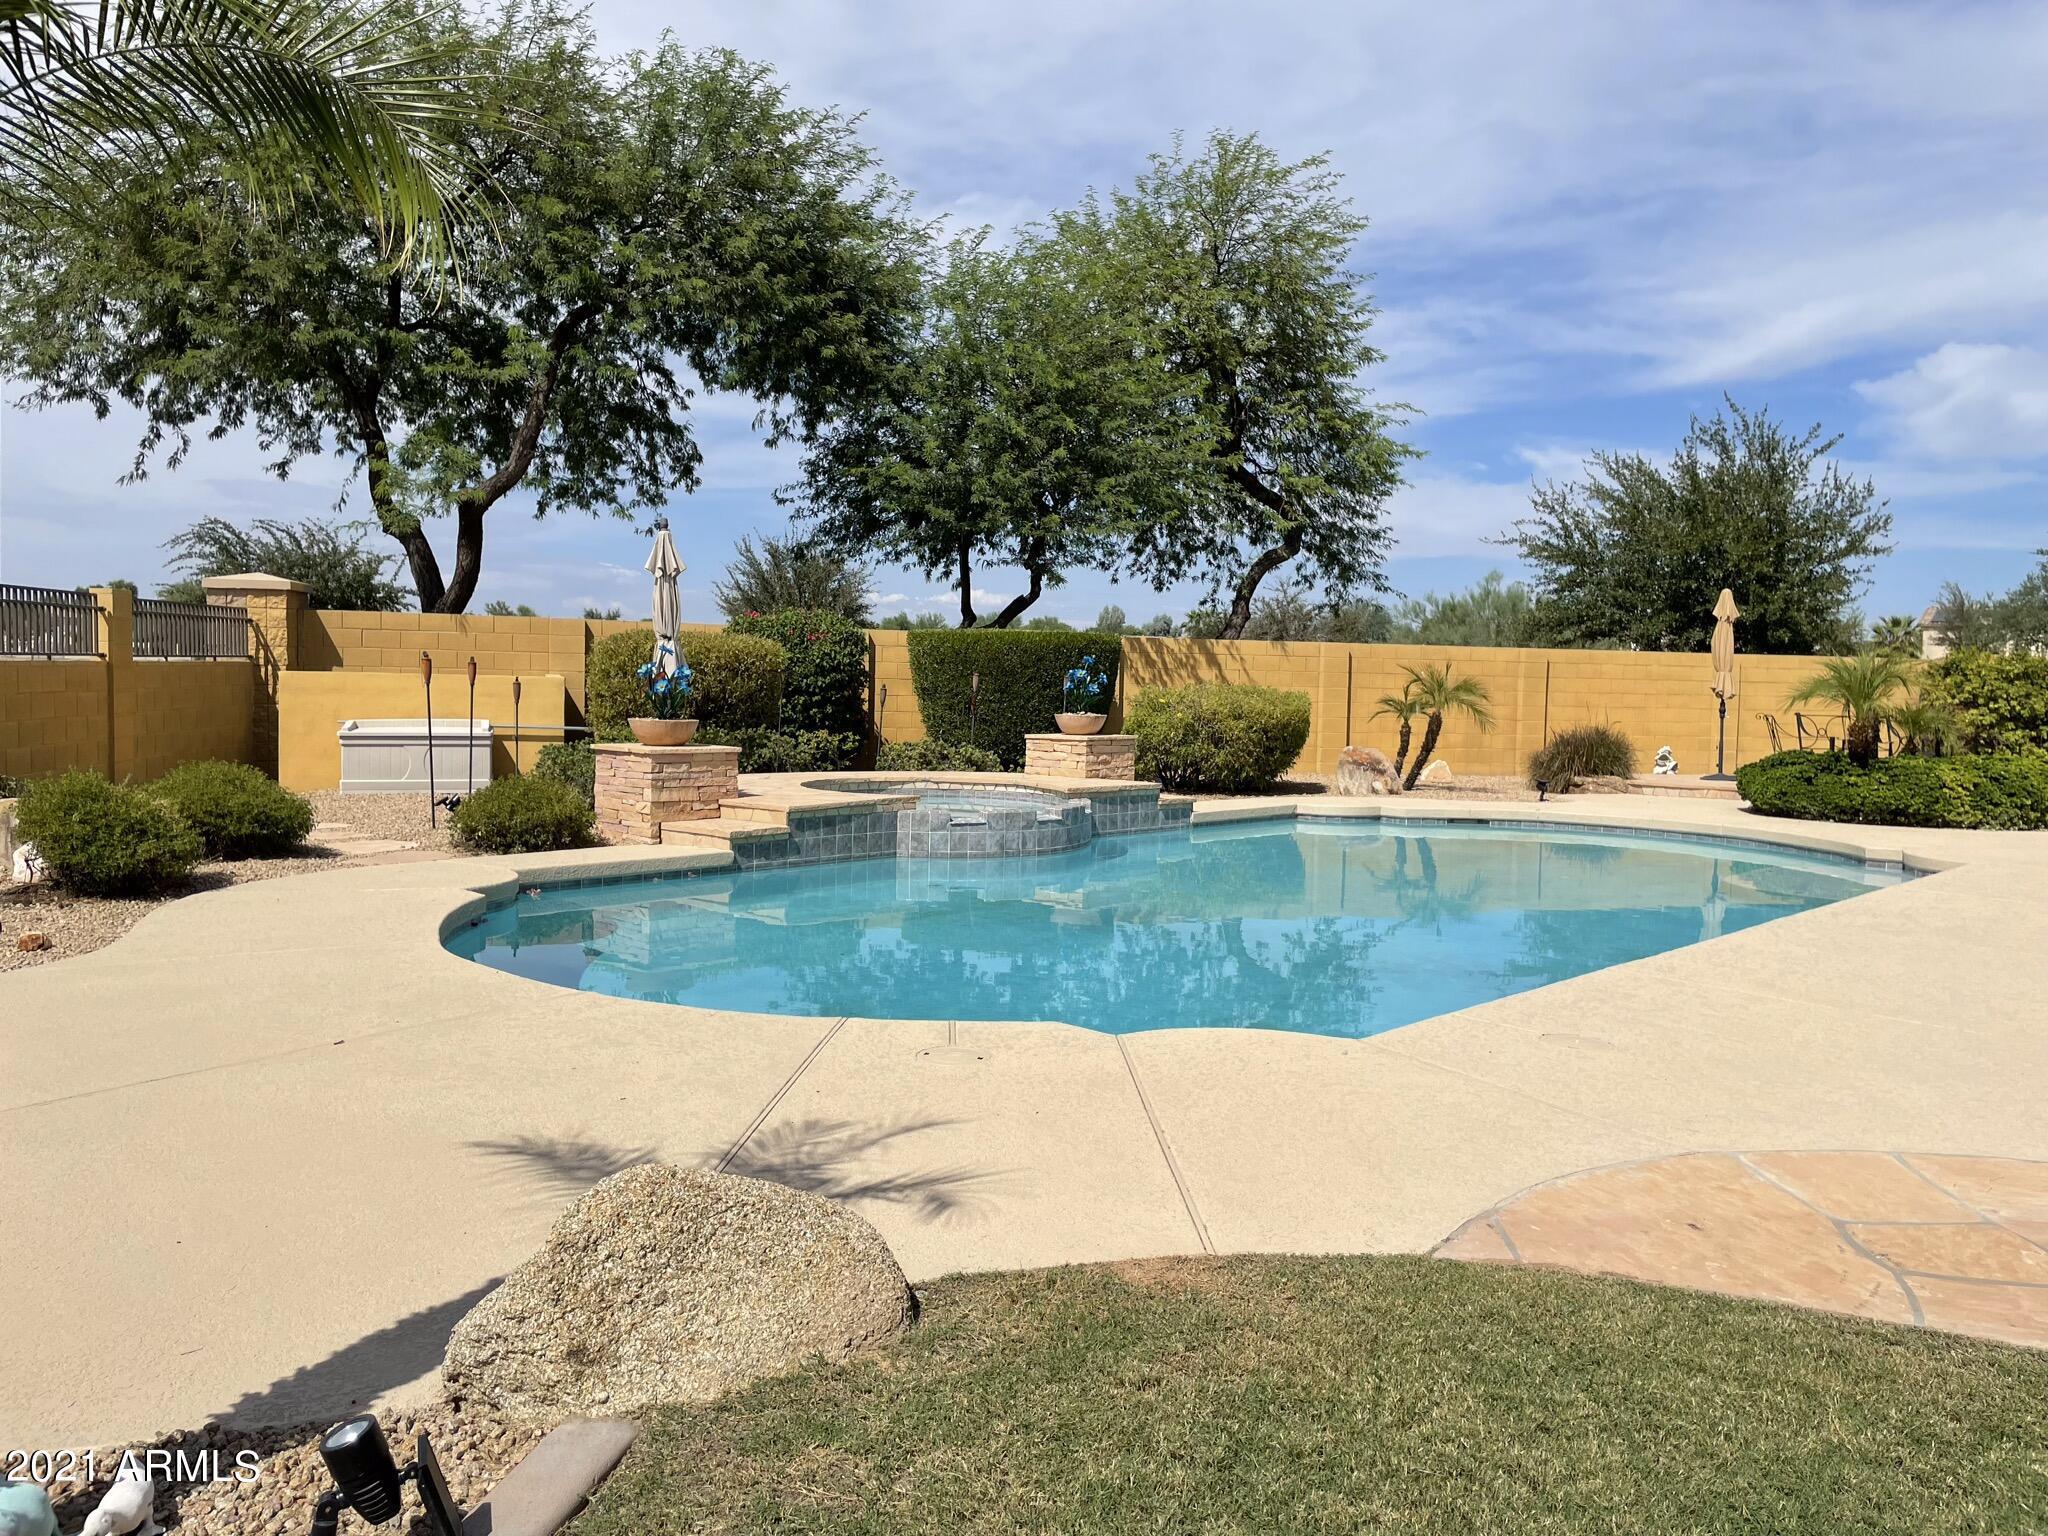 MLS 6292227 2700 N 141ST Lane, Goodyear, AZ 85395 Goodyear AZ Scenic